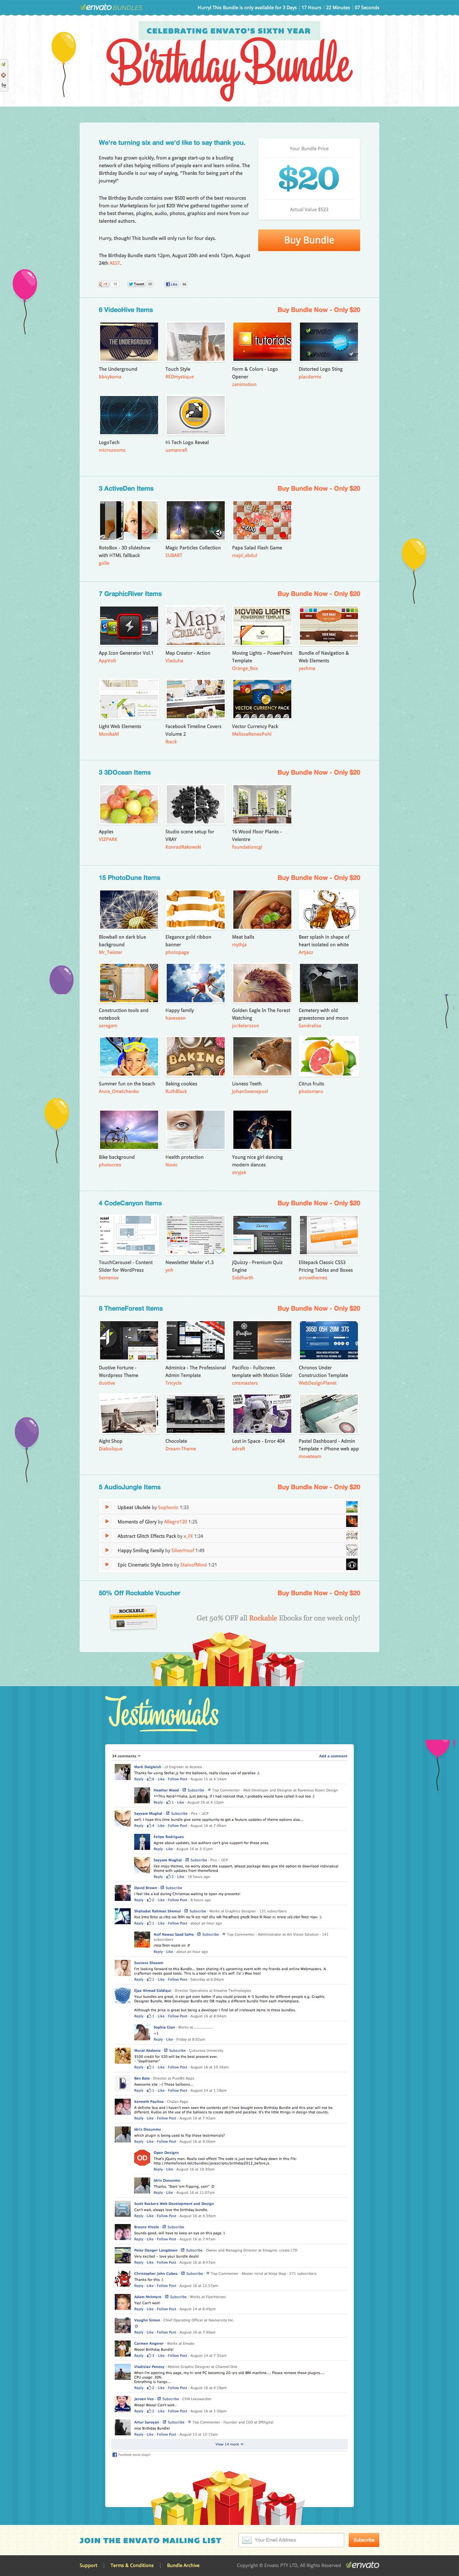 Envato Birthday Bundle 2012 Website Screenshot